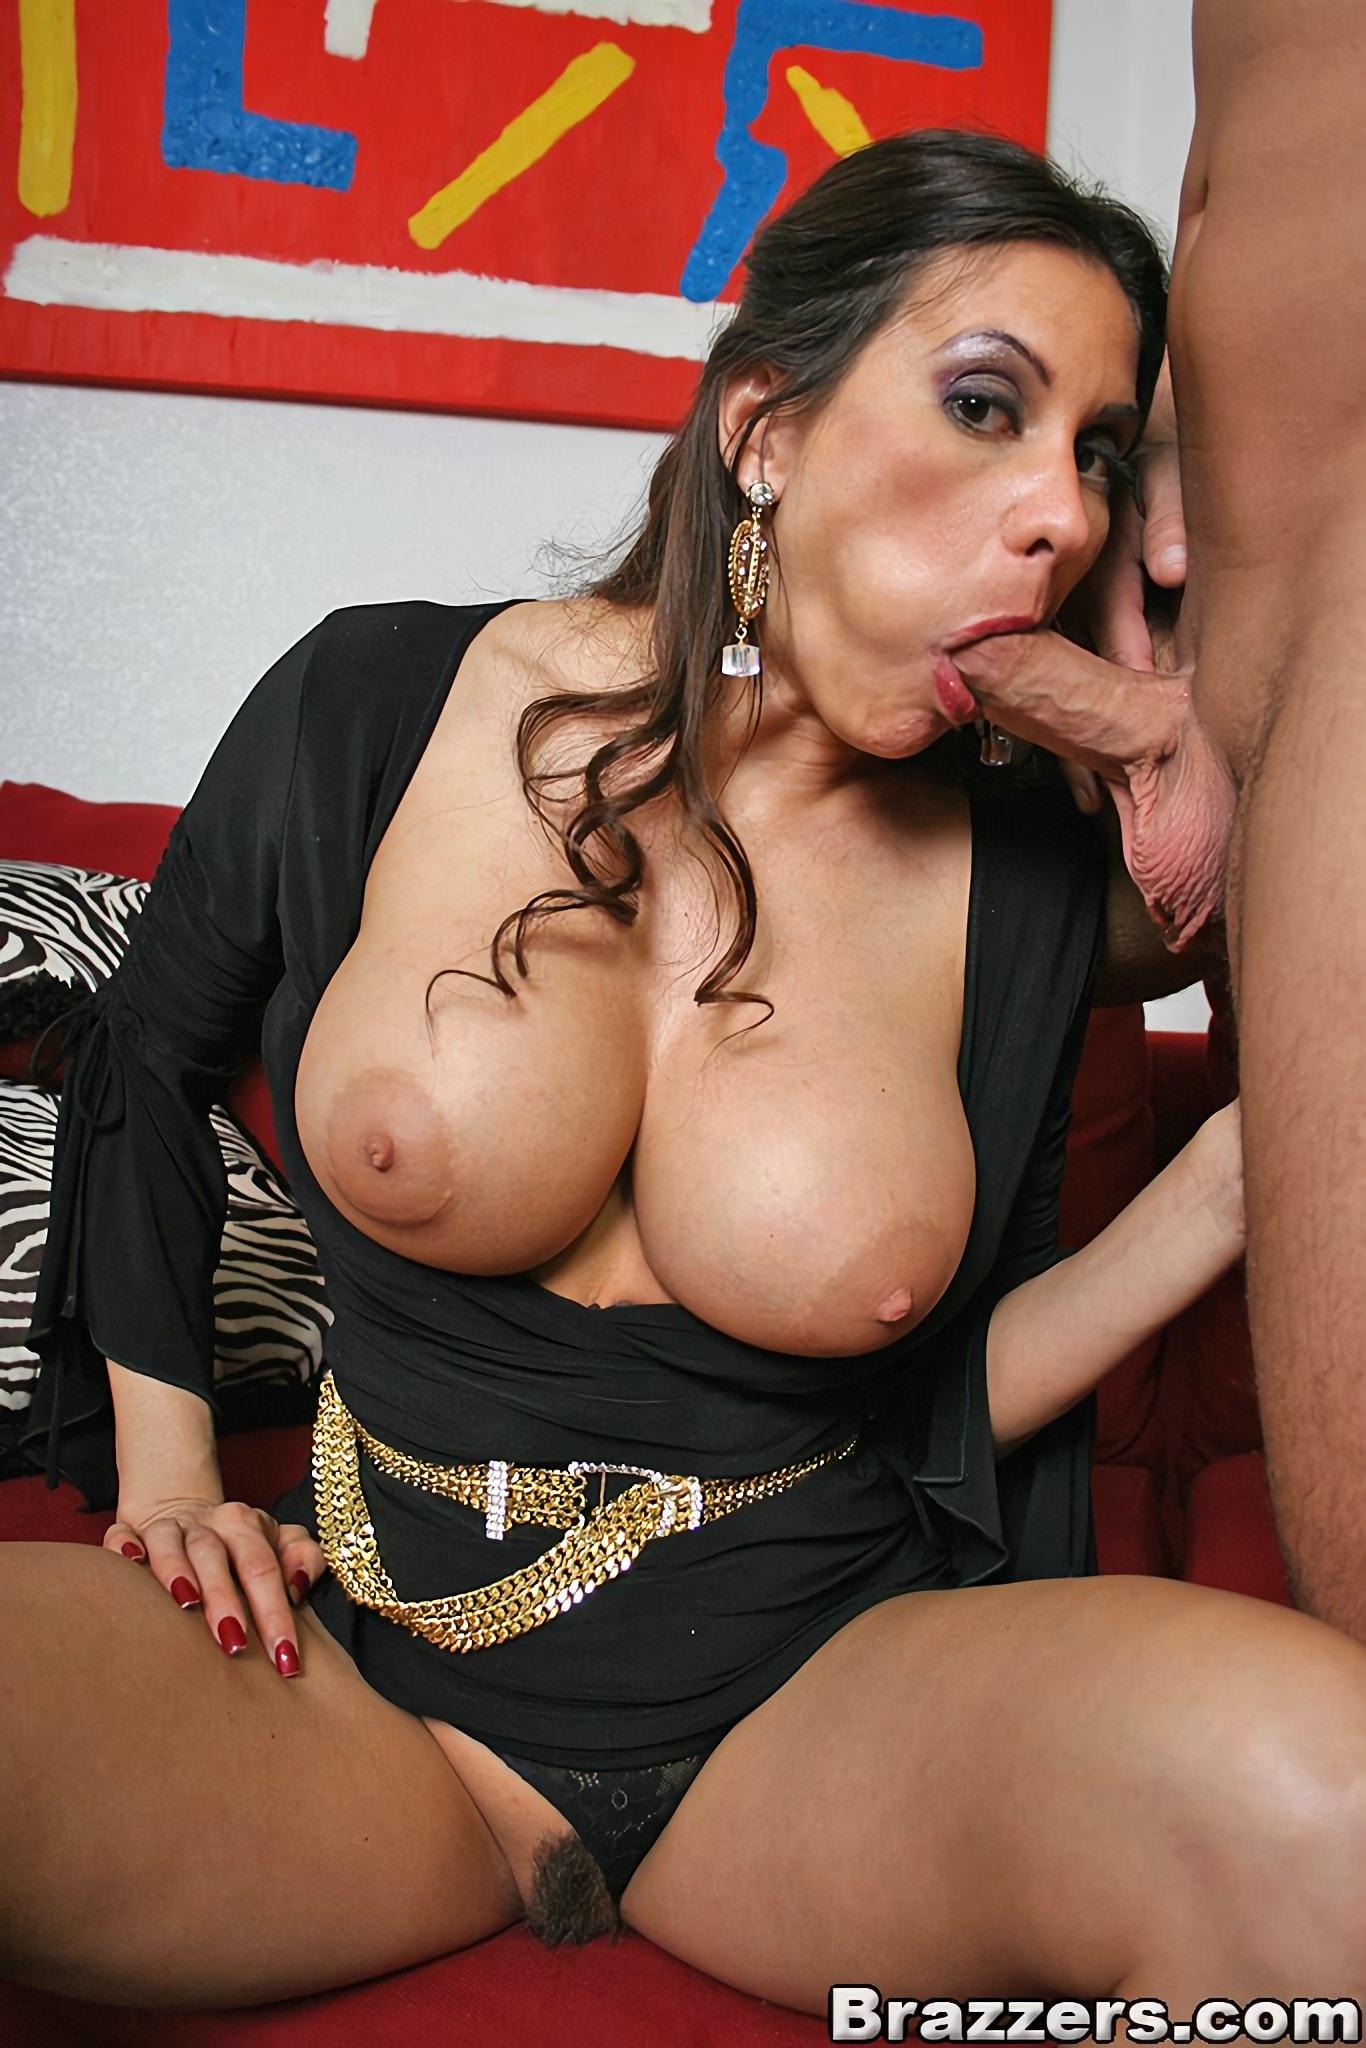 Шейла левакс возраст порно